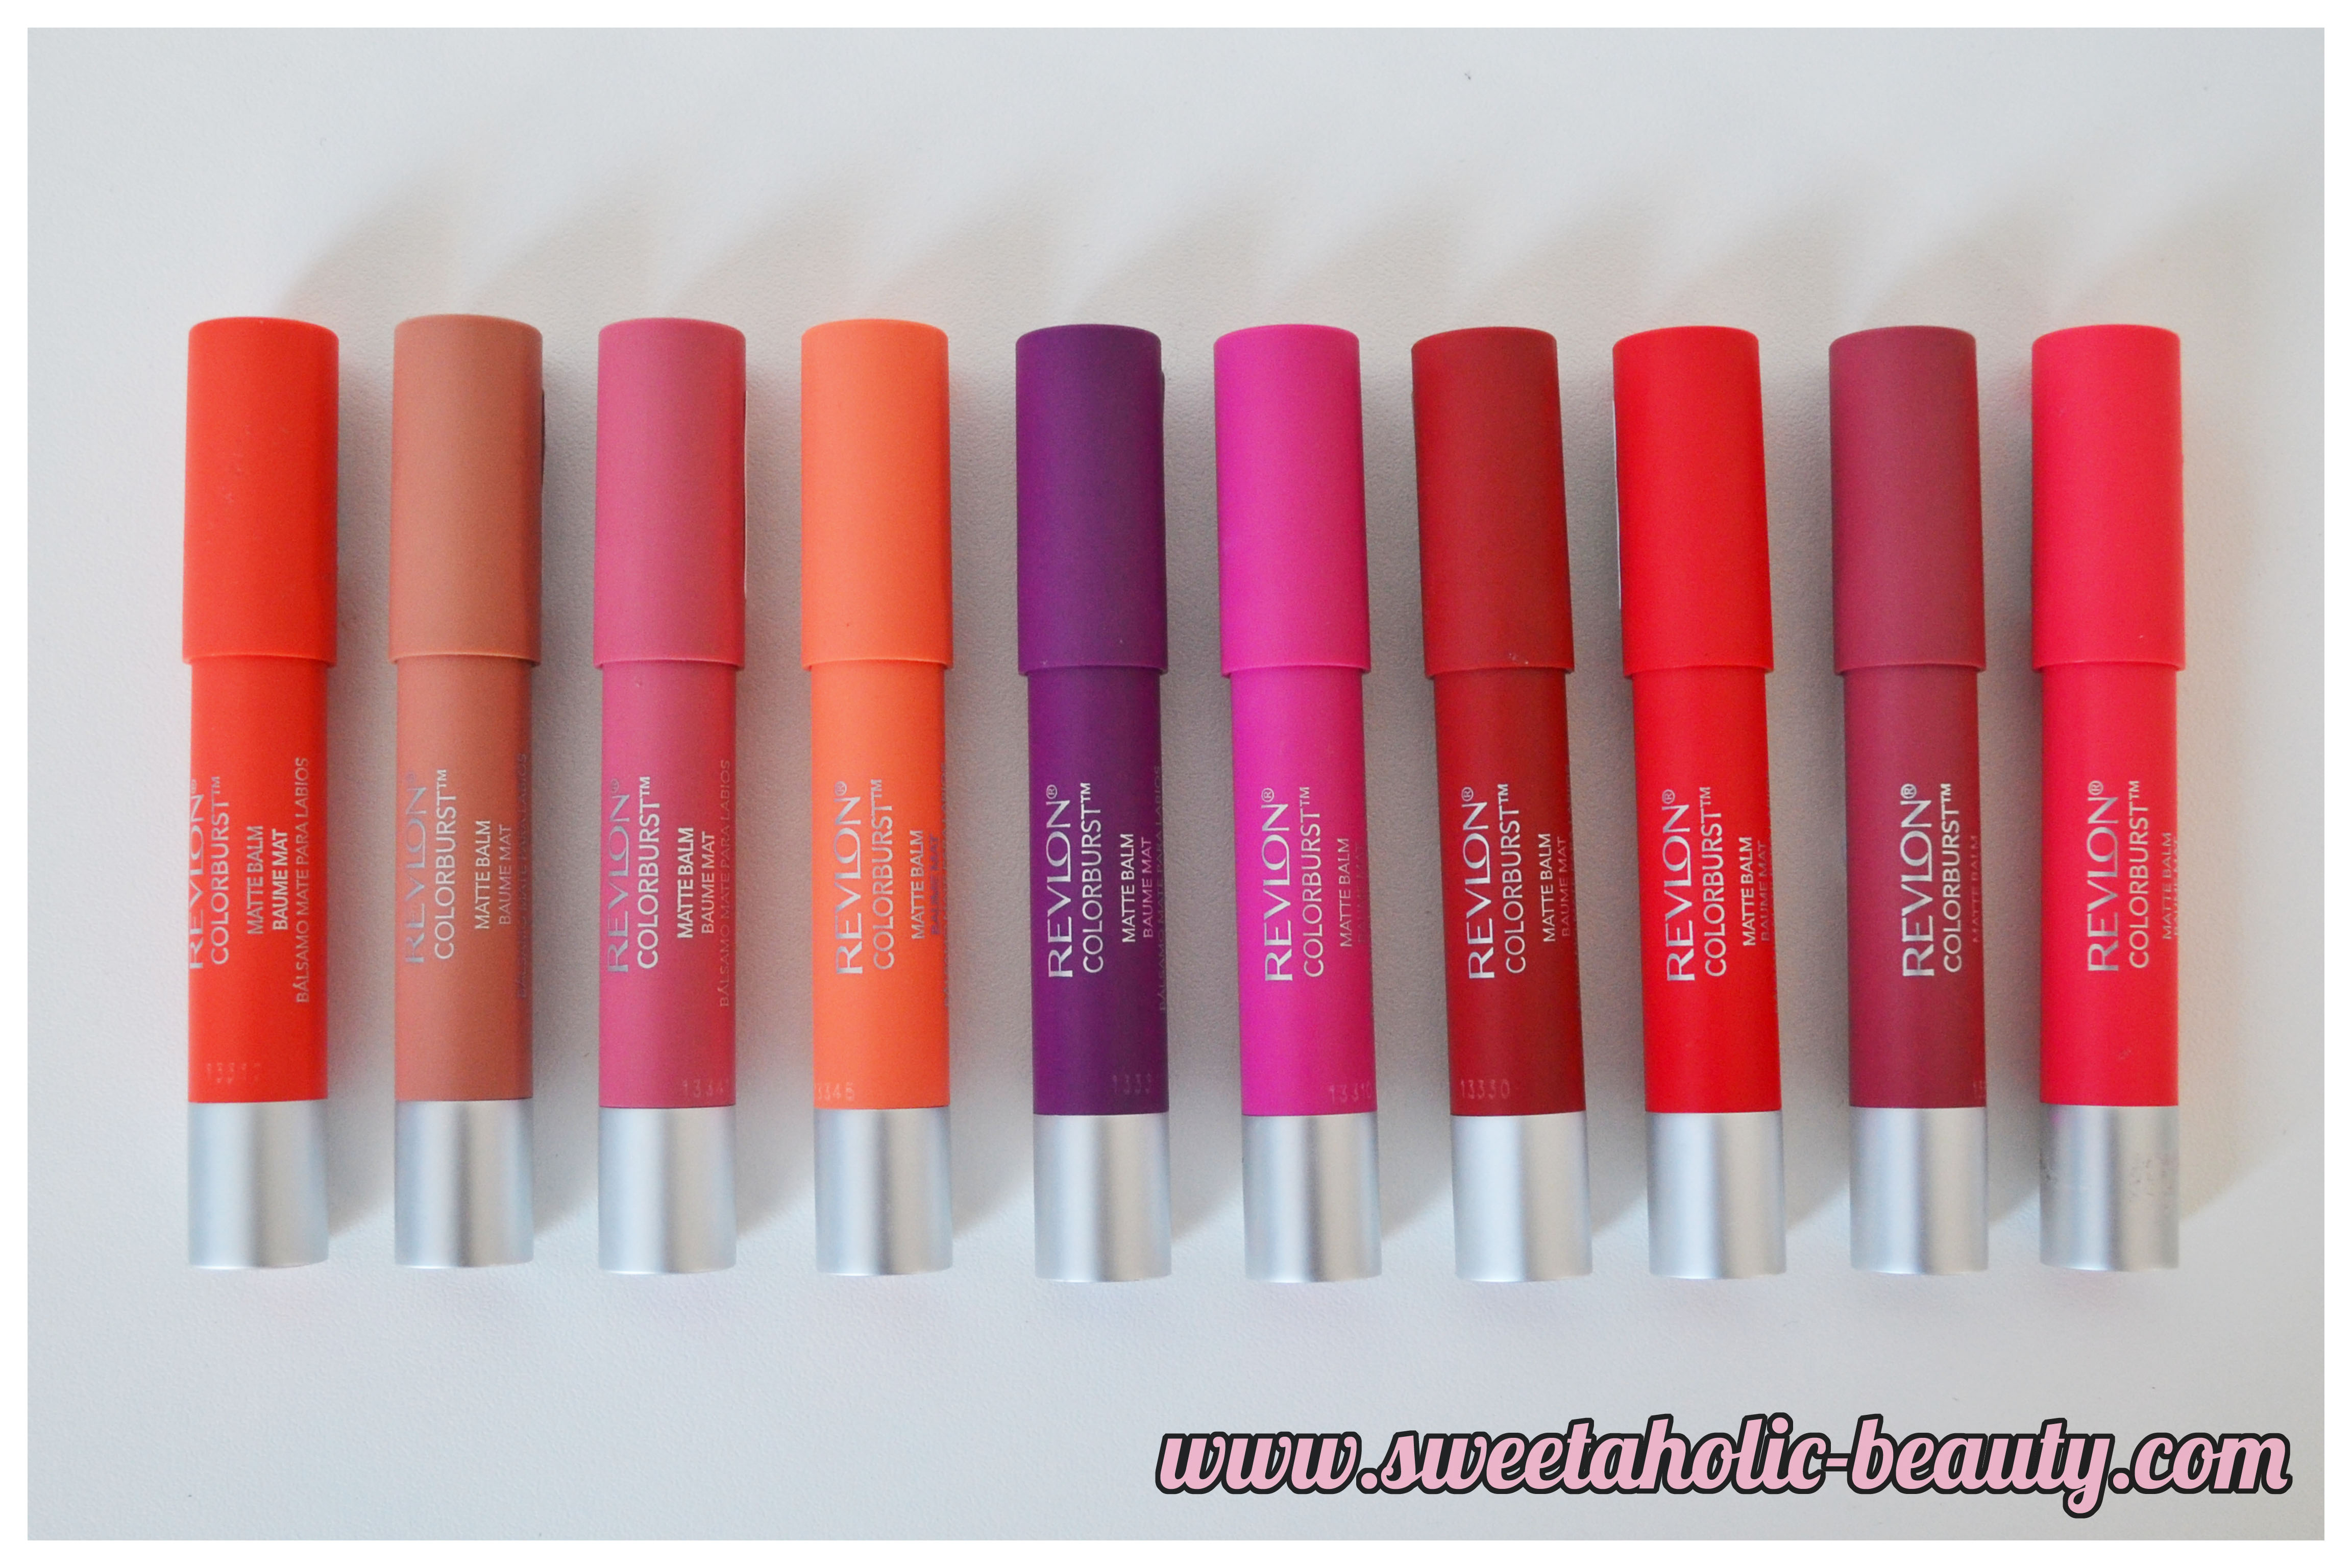 Revlon Colorburst Matte Balms Review & Swatches - Sweetaholic Beauty